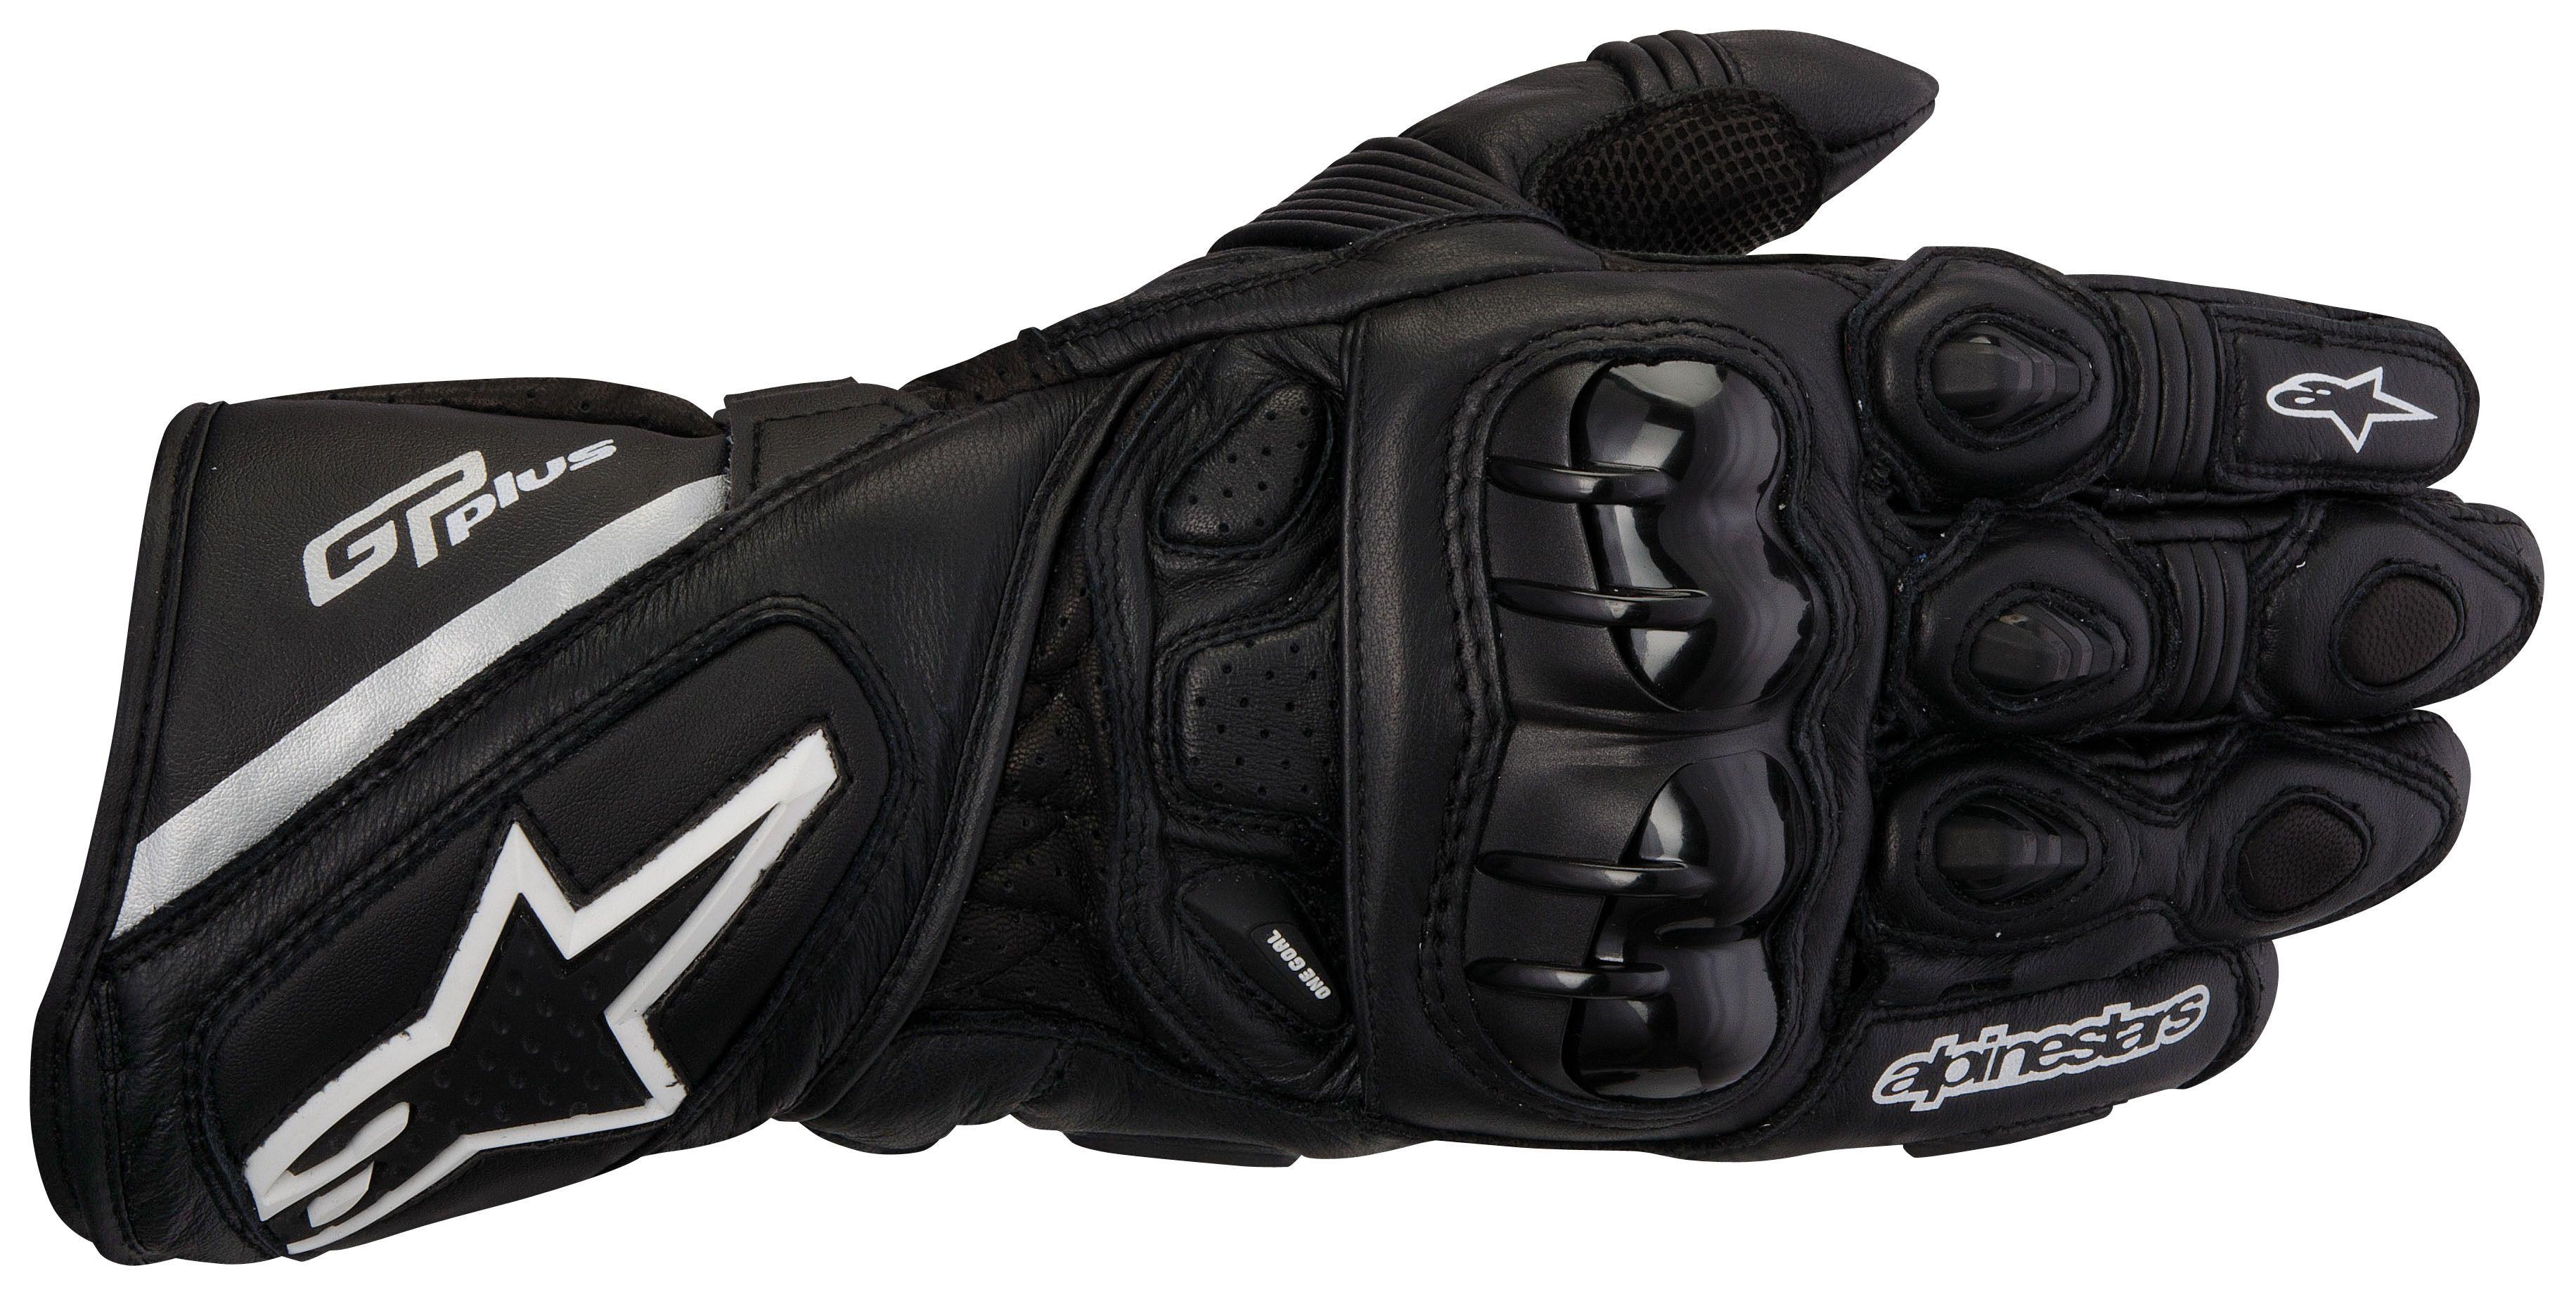 Motorcycle gloves review 2016 - Motorcycle Gloves Review 2016